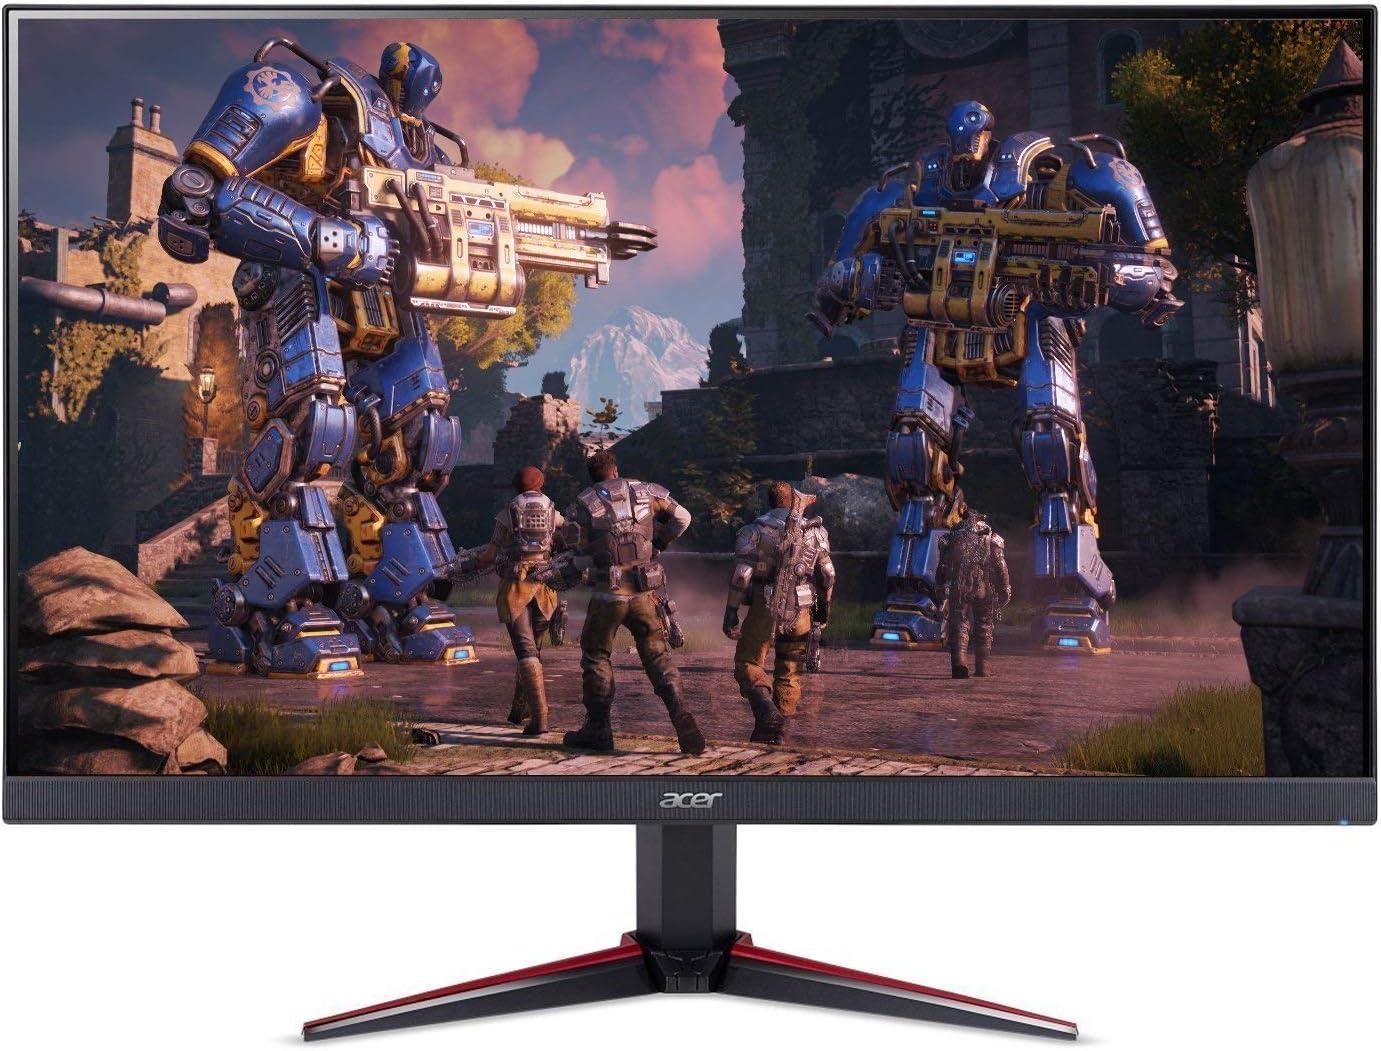 Acer Nitro VG0 27in Widescreen Monitor Display Full HD (1920 x 1080) 1ms 75Hz (Renewed)